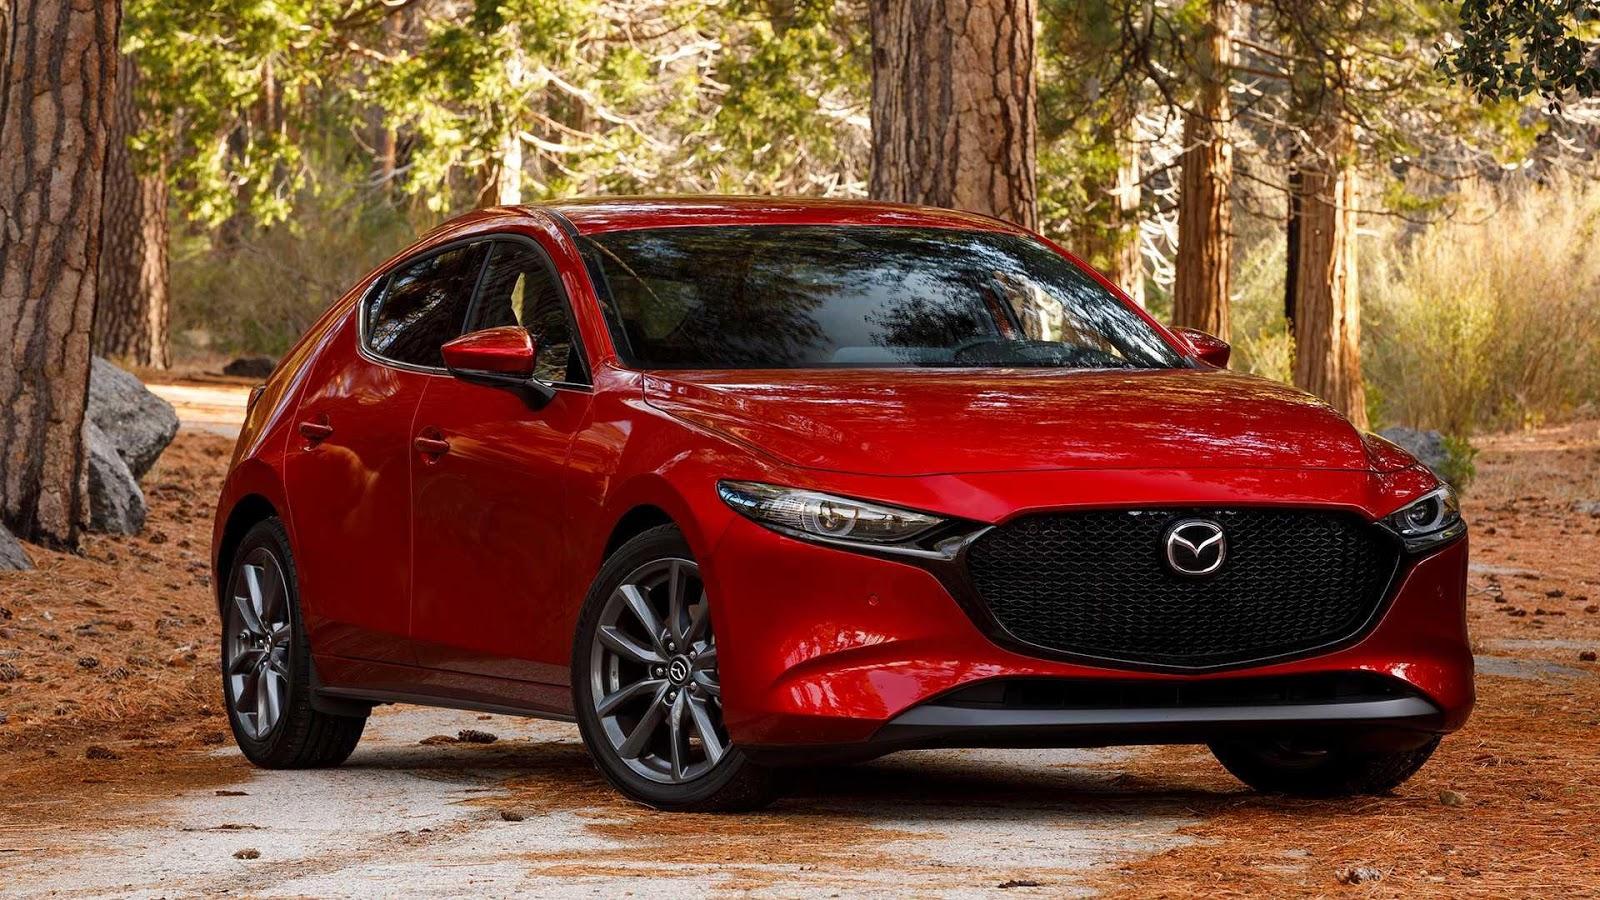 What Is New In Mazda 3 Sedan 2020? - Talk Geo - Lifestyle ...